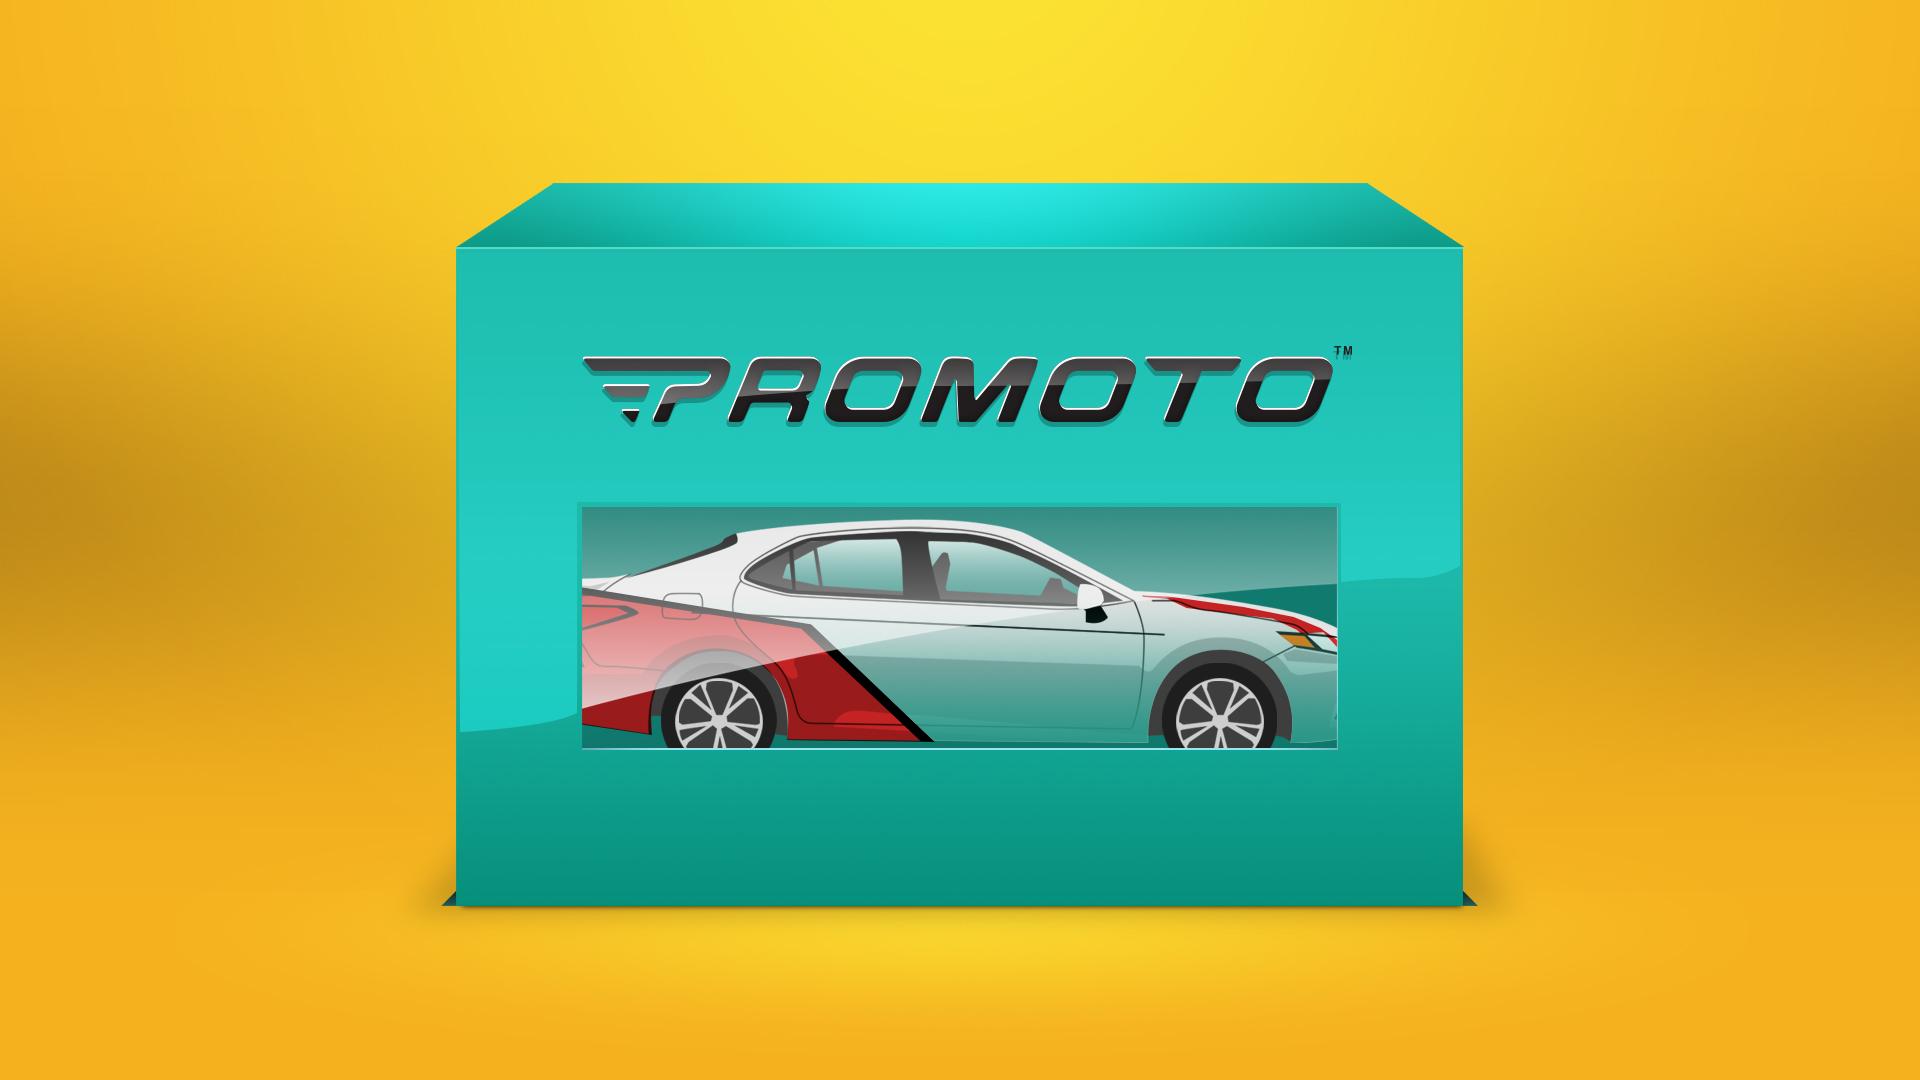 Promoto_B_05.jpg